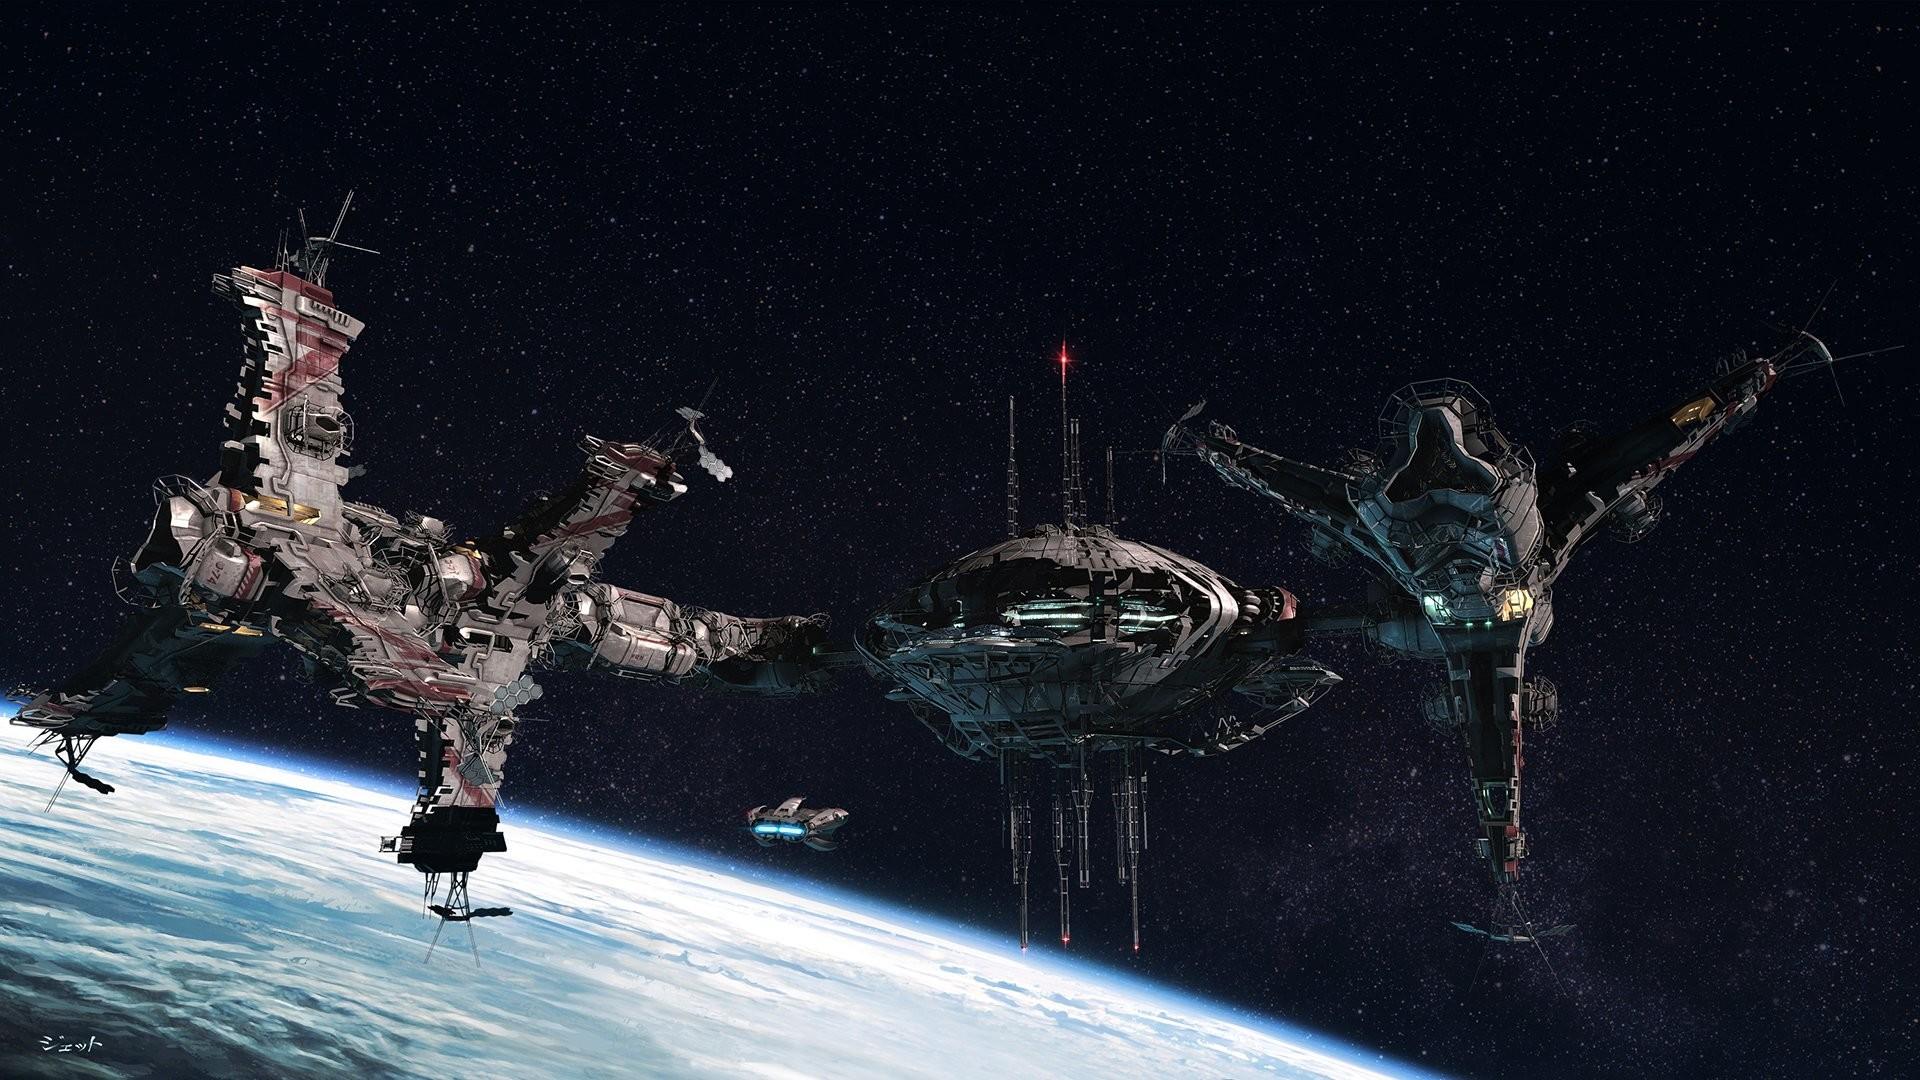 Battlestar Galactica Space Spaceship · HD Wallpaper   Background ID:198970